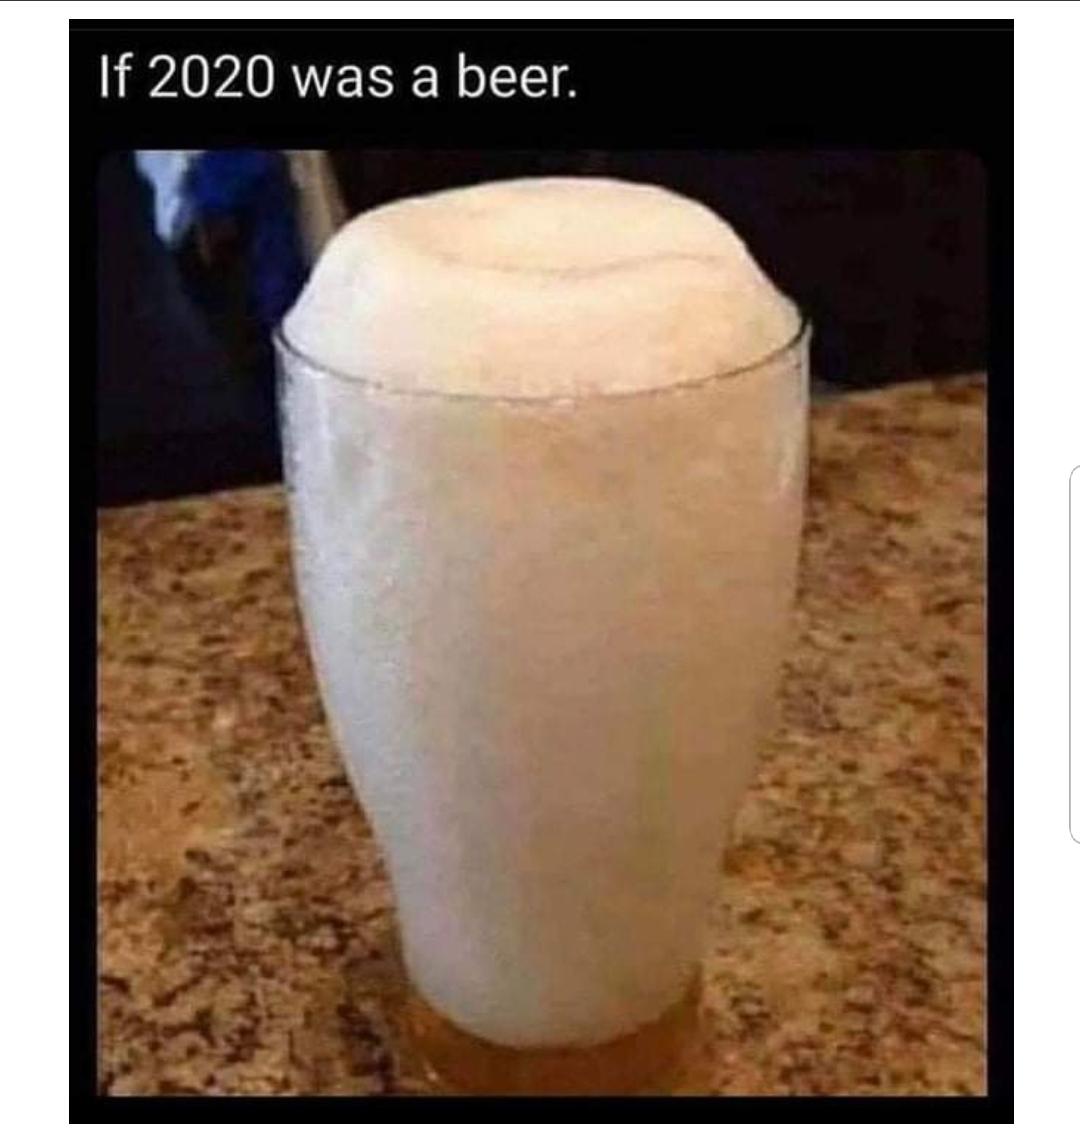 2020 beer meme, 2020 meme, 2020 memes, funny 2020 meme, funny 2020 memes, meme about 2020, memes about 2020, hilarious 2020 meme, hilarious 2020 memes, funny memes 2020, funny meme 2020, funny meme about 2020, funny memes about 2020, 2020 funny meme, 2020 funny memes, meme funny 2020, memes funny 2020, 2020 funny meme, 2020 funny memes, hilarious memes about 2020, hilarious meme about 2020